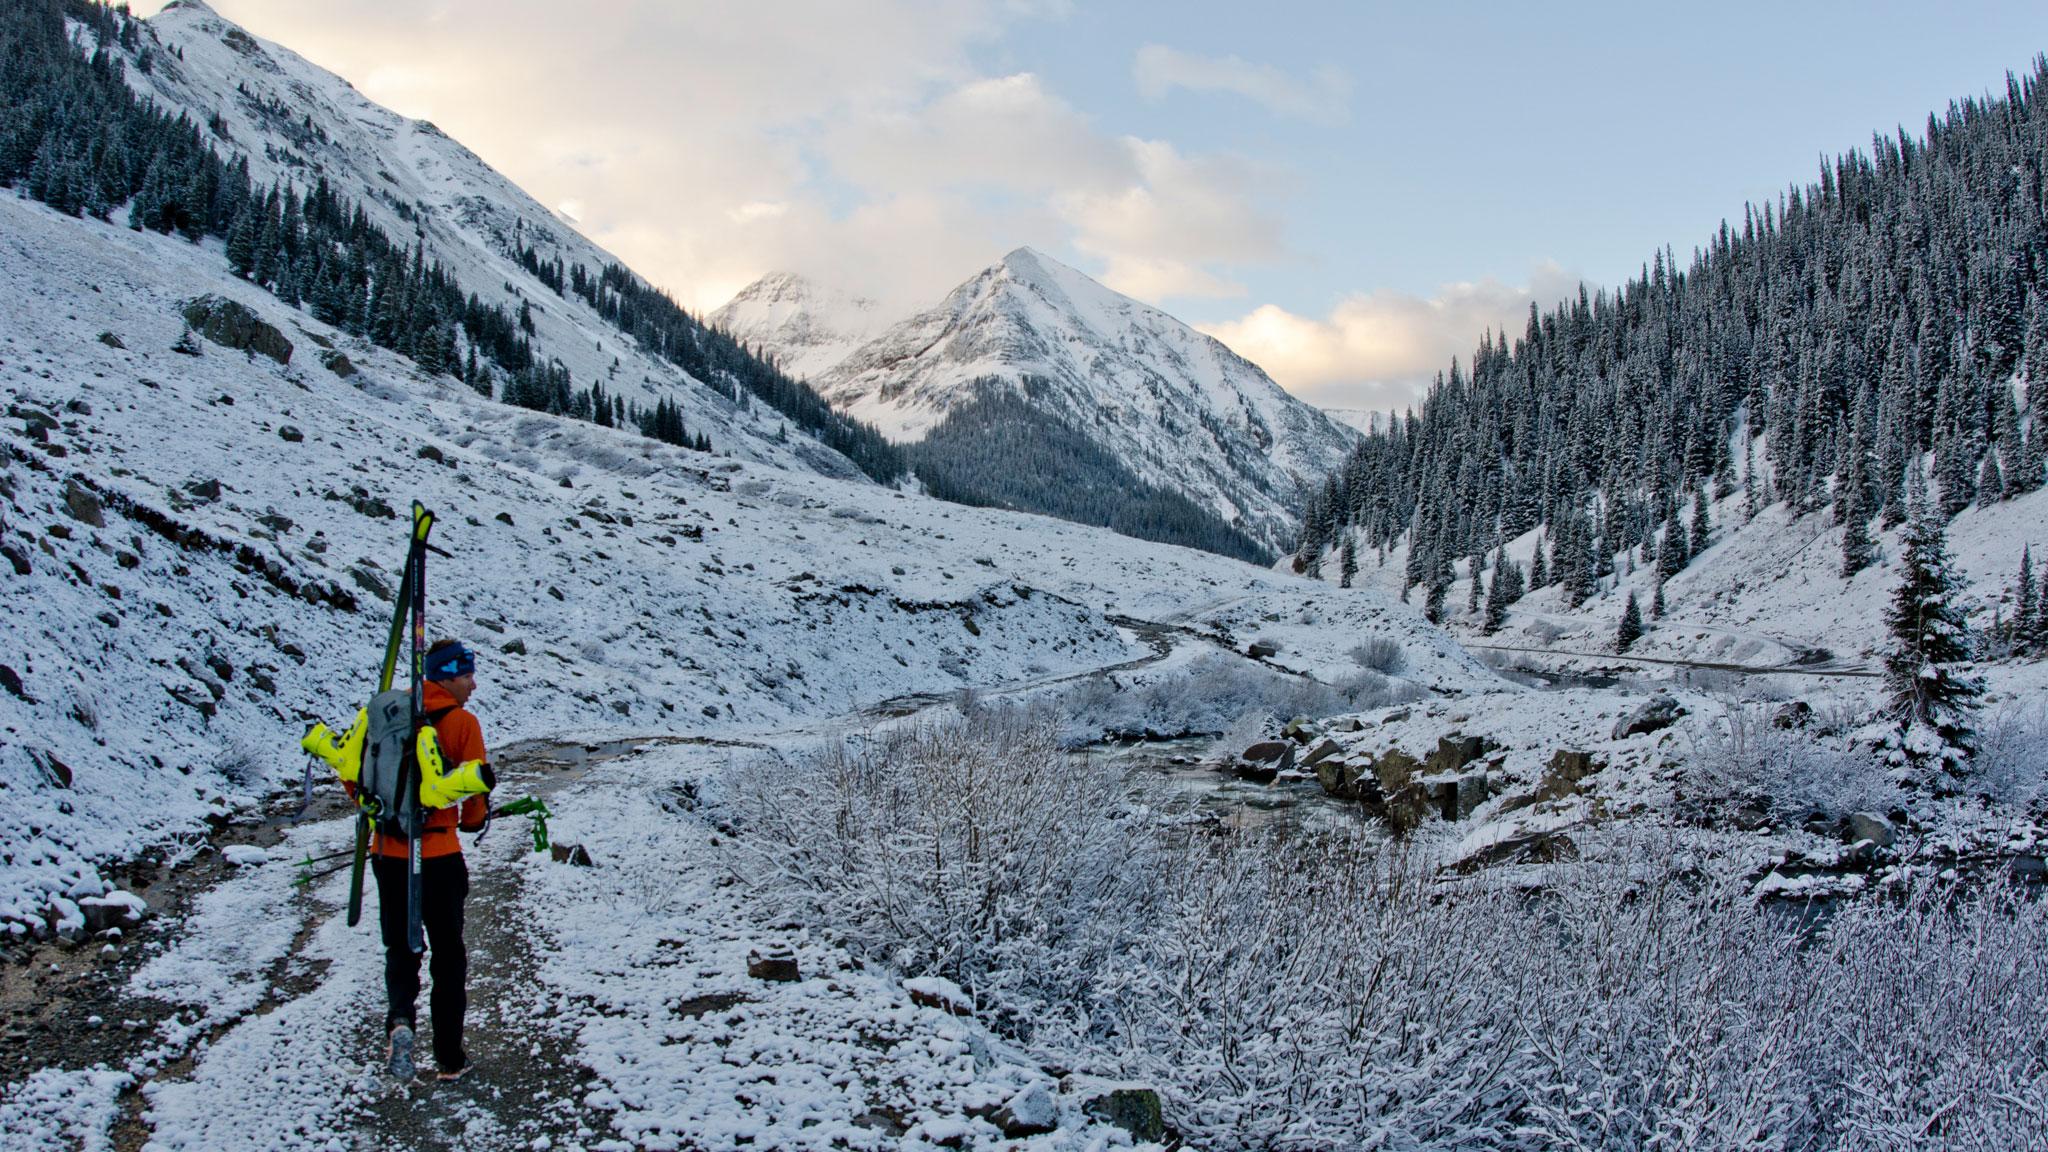 Skiing Colorado's Centennial Peaks